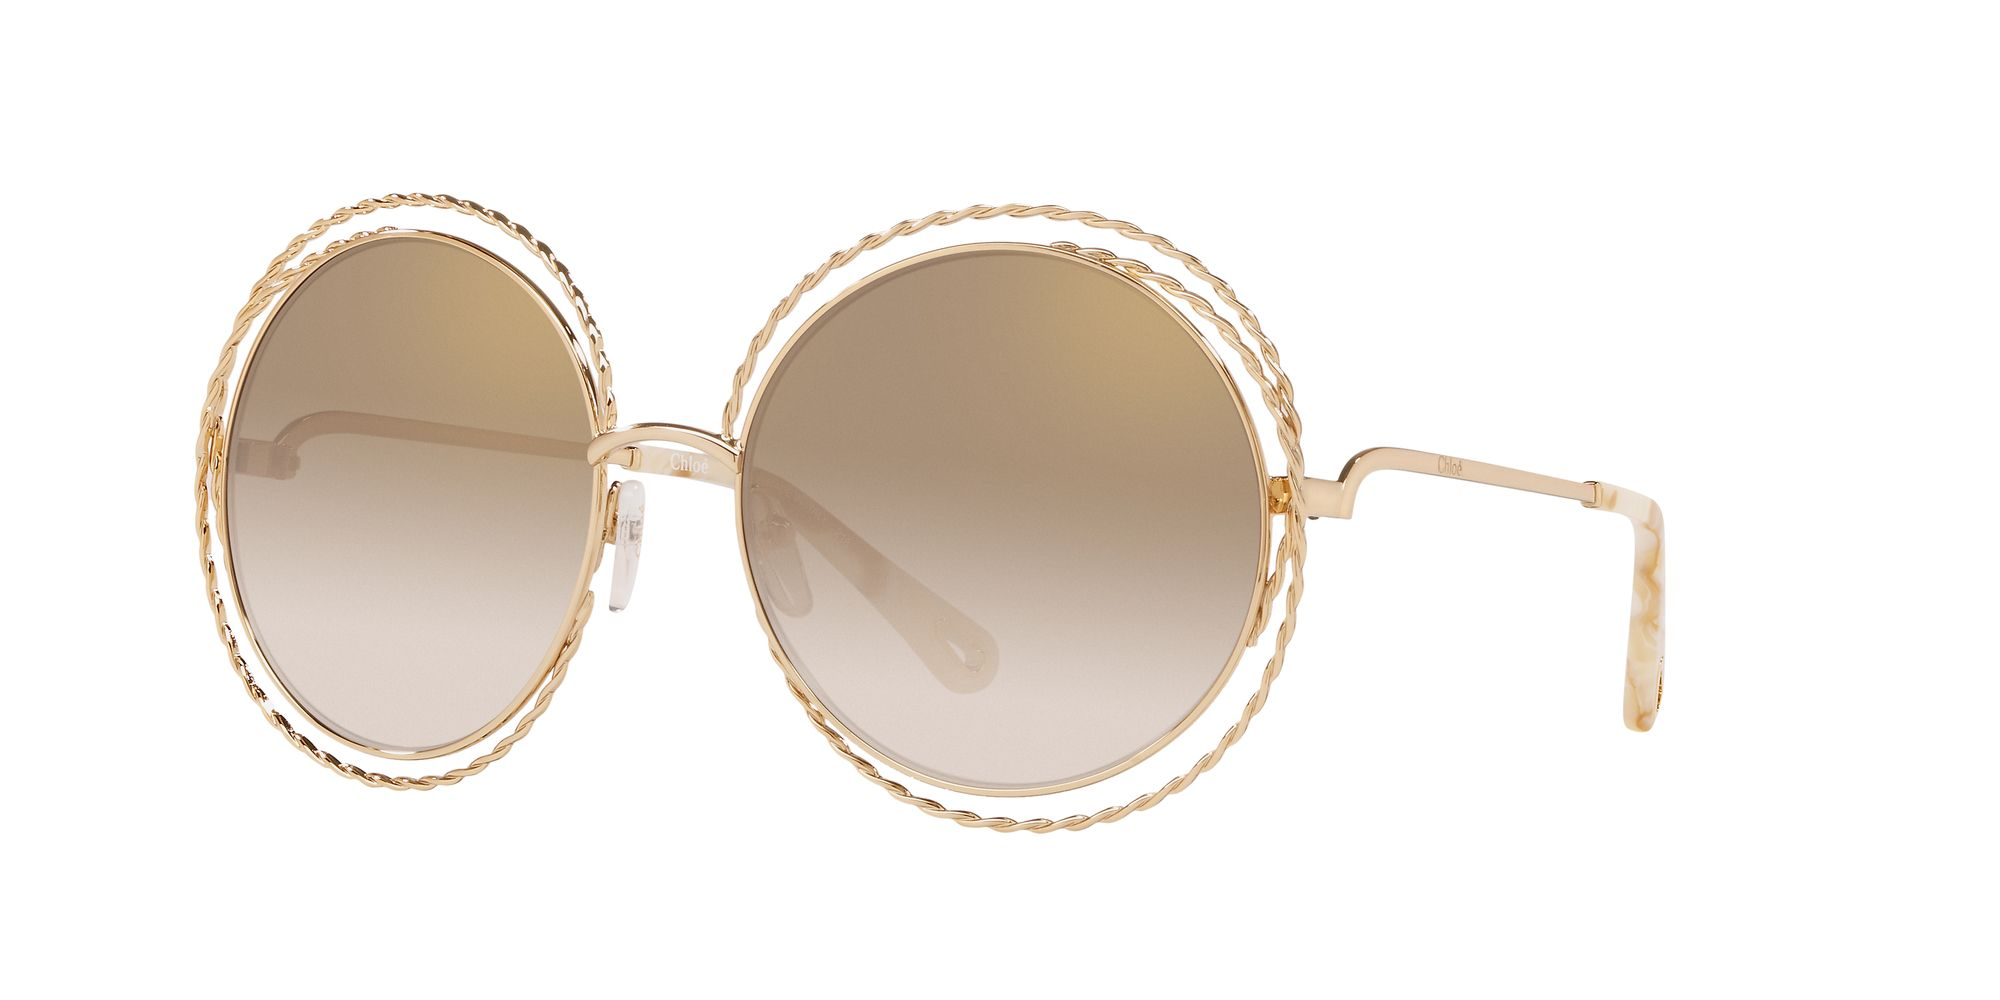 Chloe Chloé CE114ST Women's Round Sunglasses, Gold/Brown